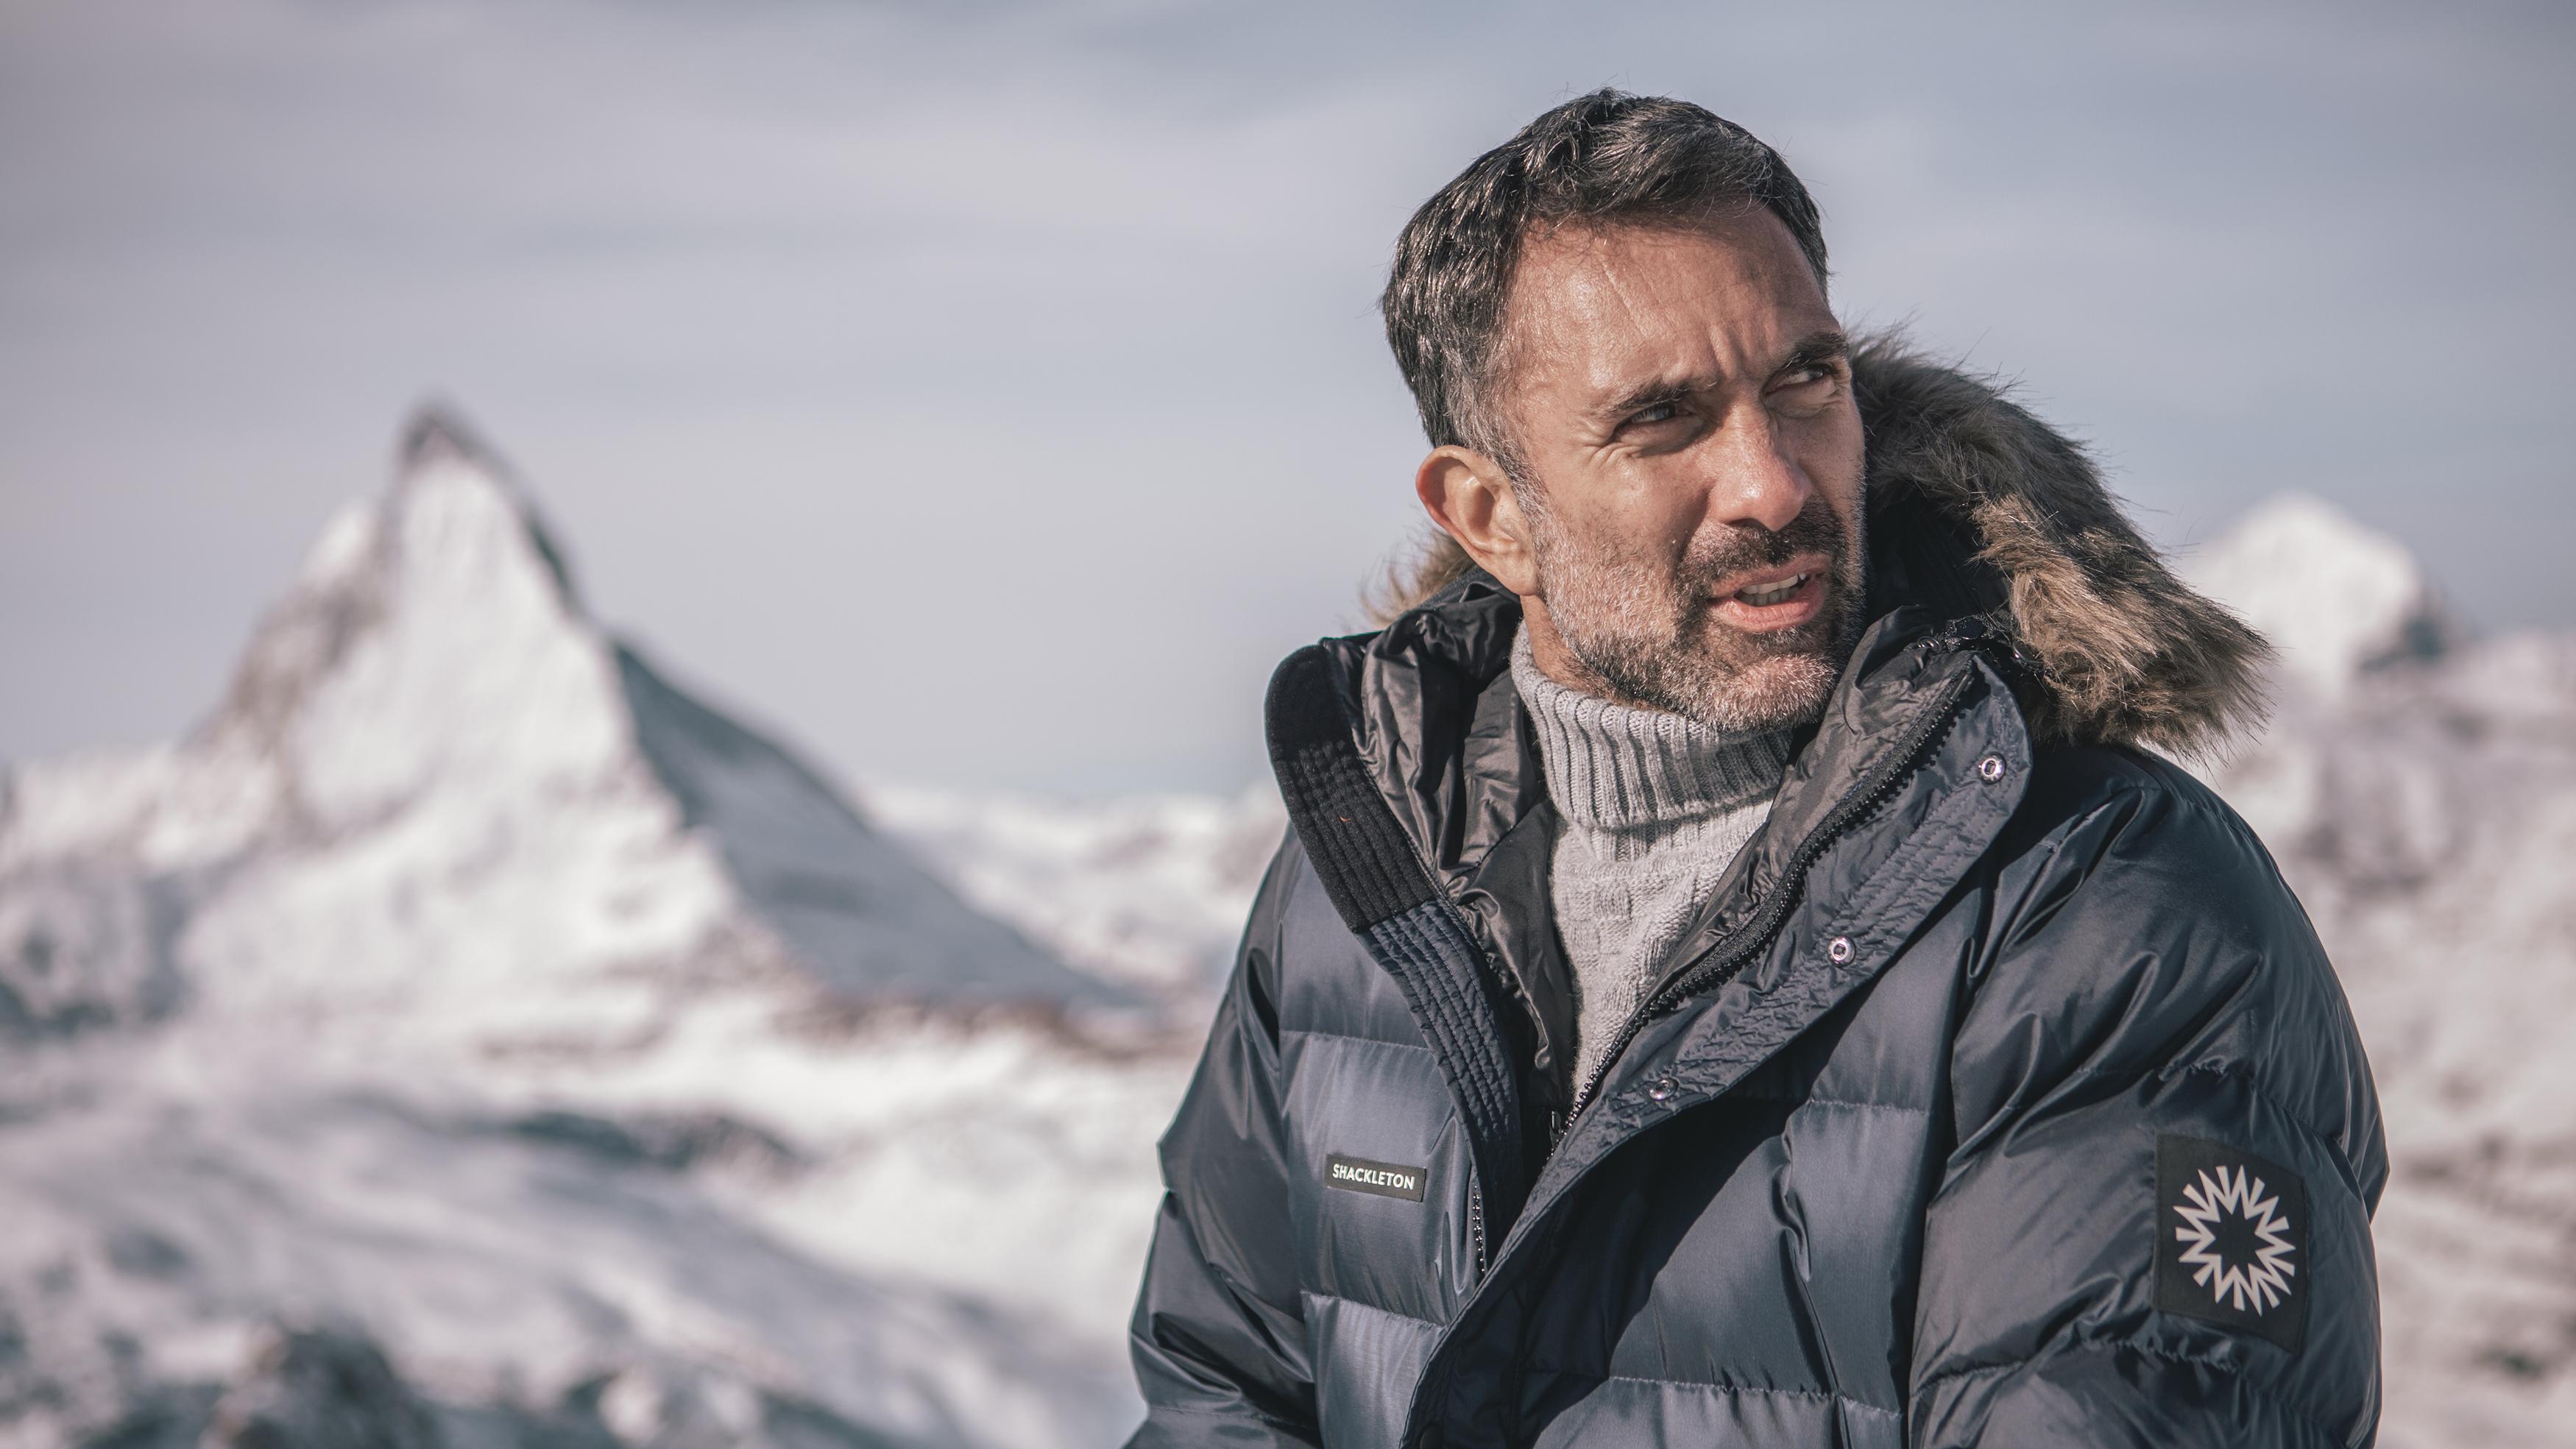 UK Mens Winter Jacket Hooded Thick Coats Waterproof Ski Snow Hiking Warm Outwear